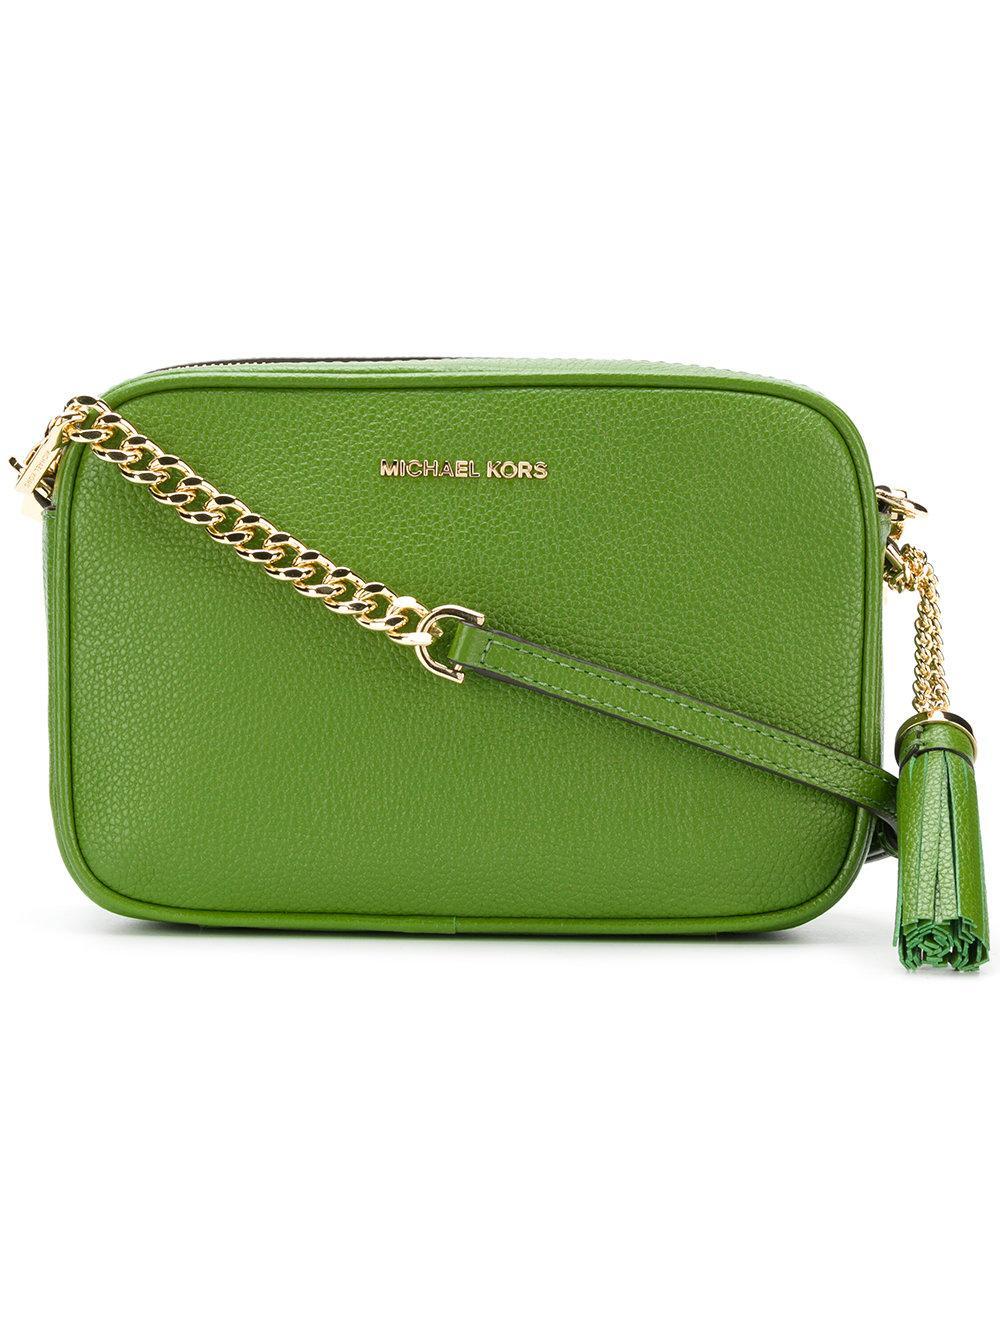 c8d2bf99beee Michael Michael Kors Ginny Crossbody Bag